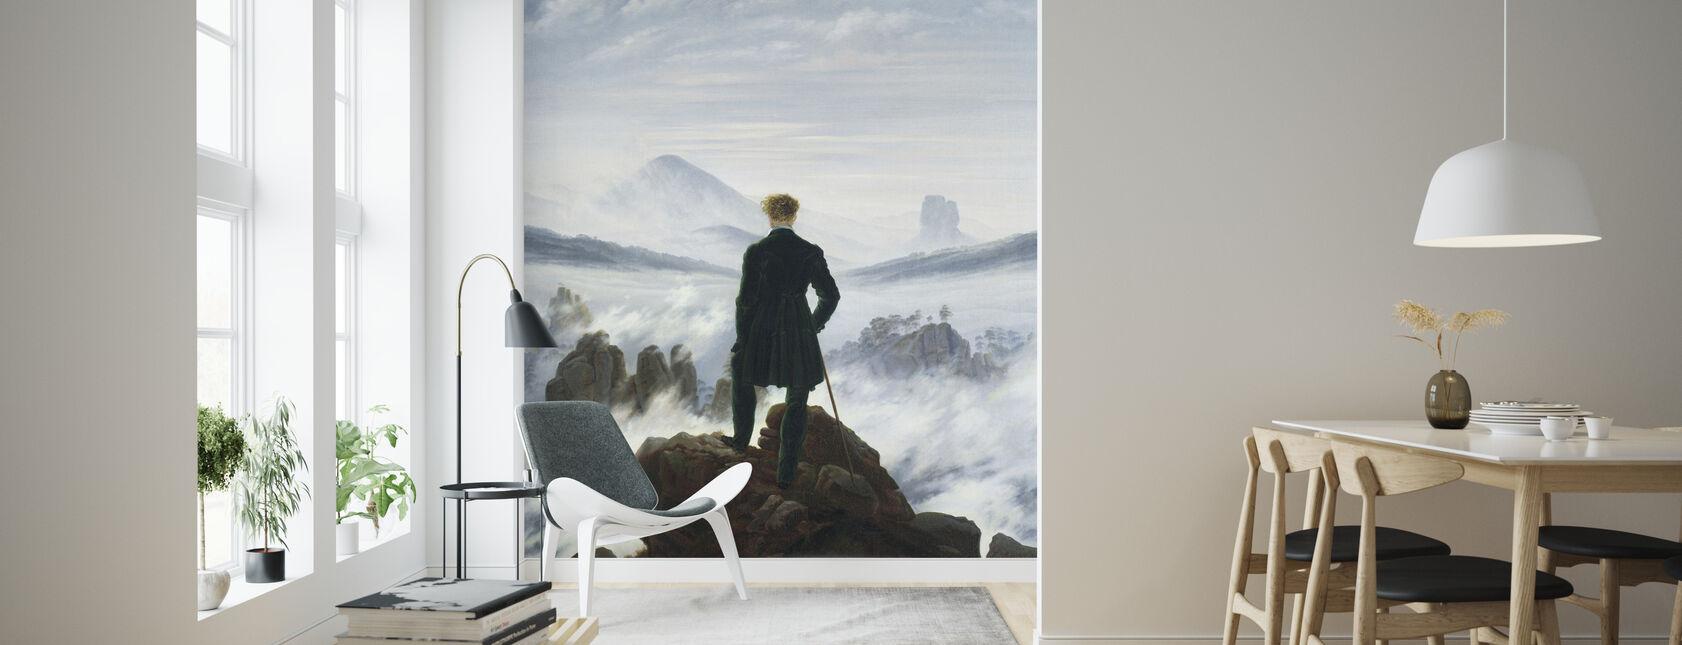 Wanderer above the Sea of Fog - Caspar Friedrich - Wallpaper - Living Room